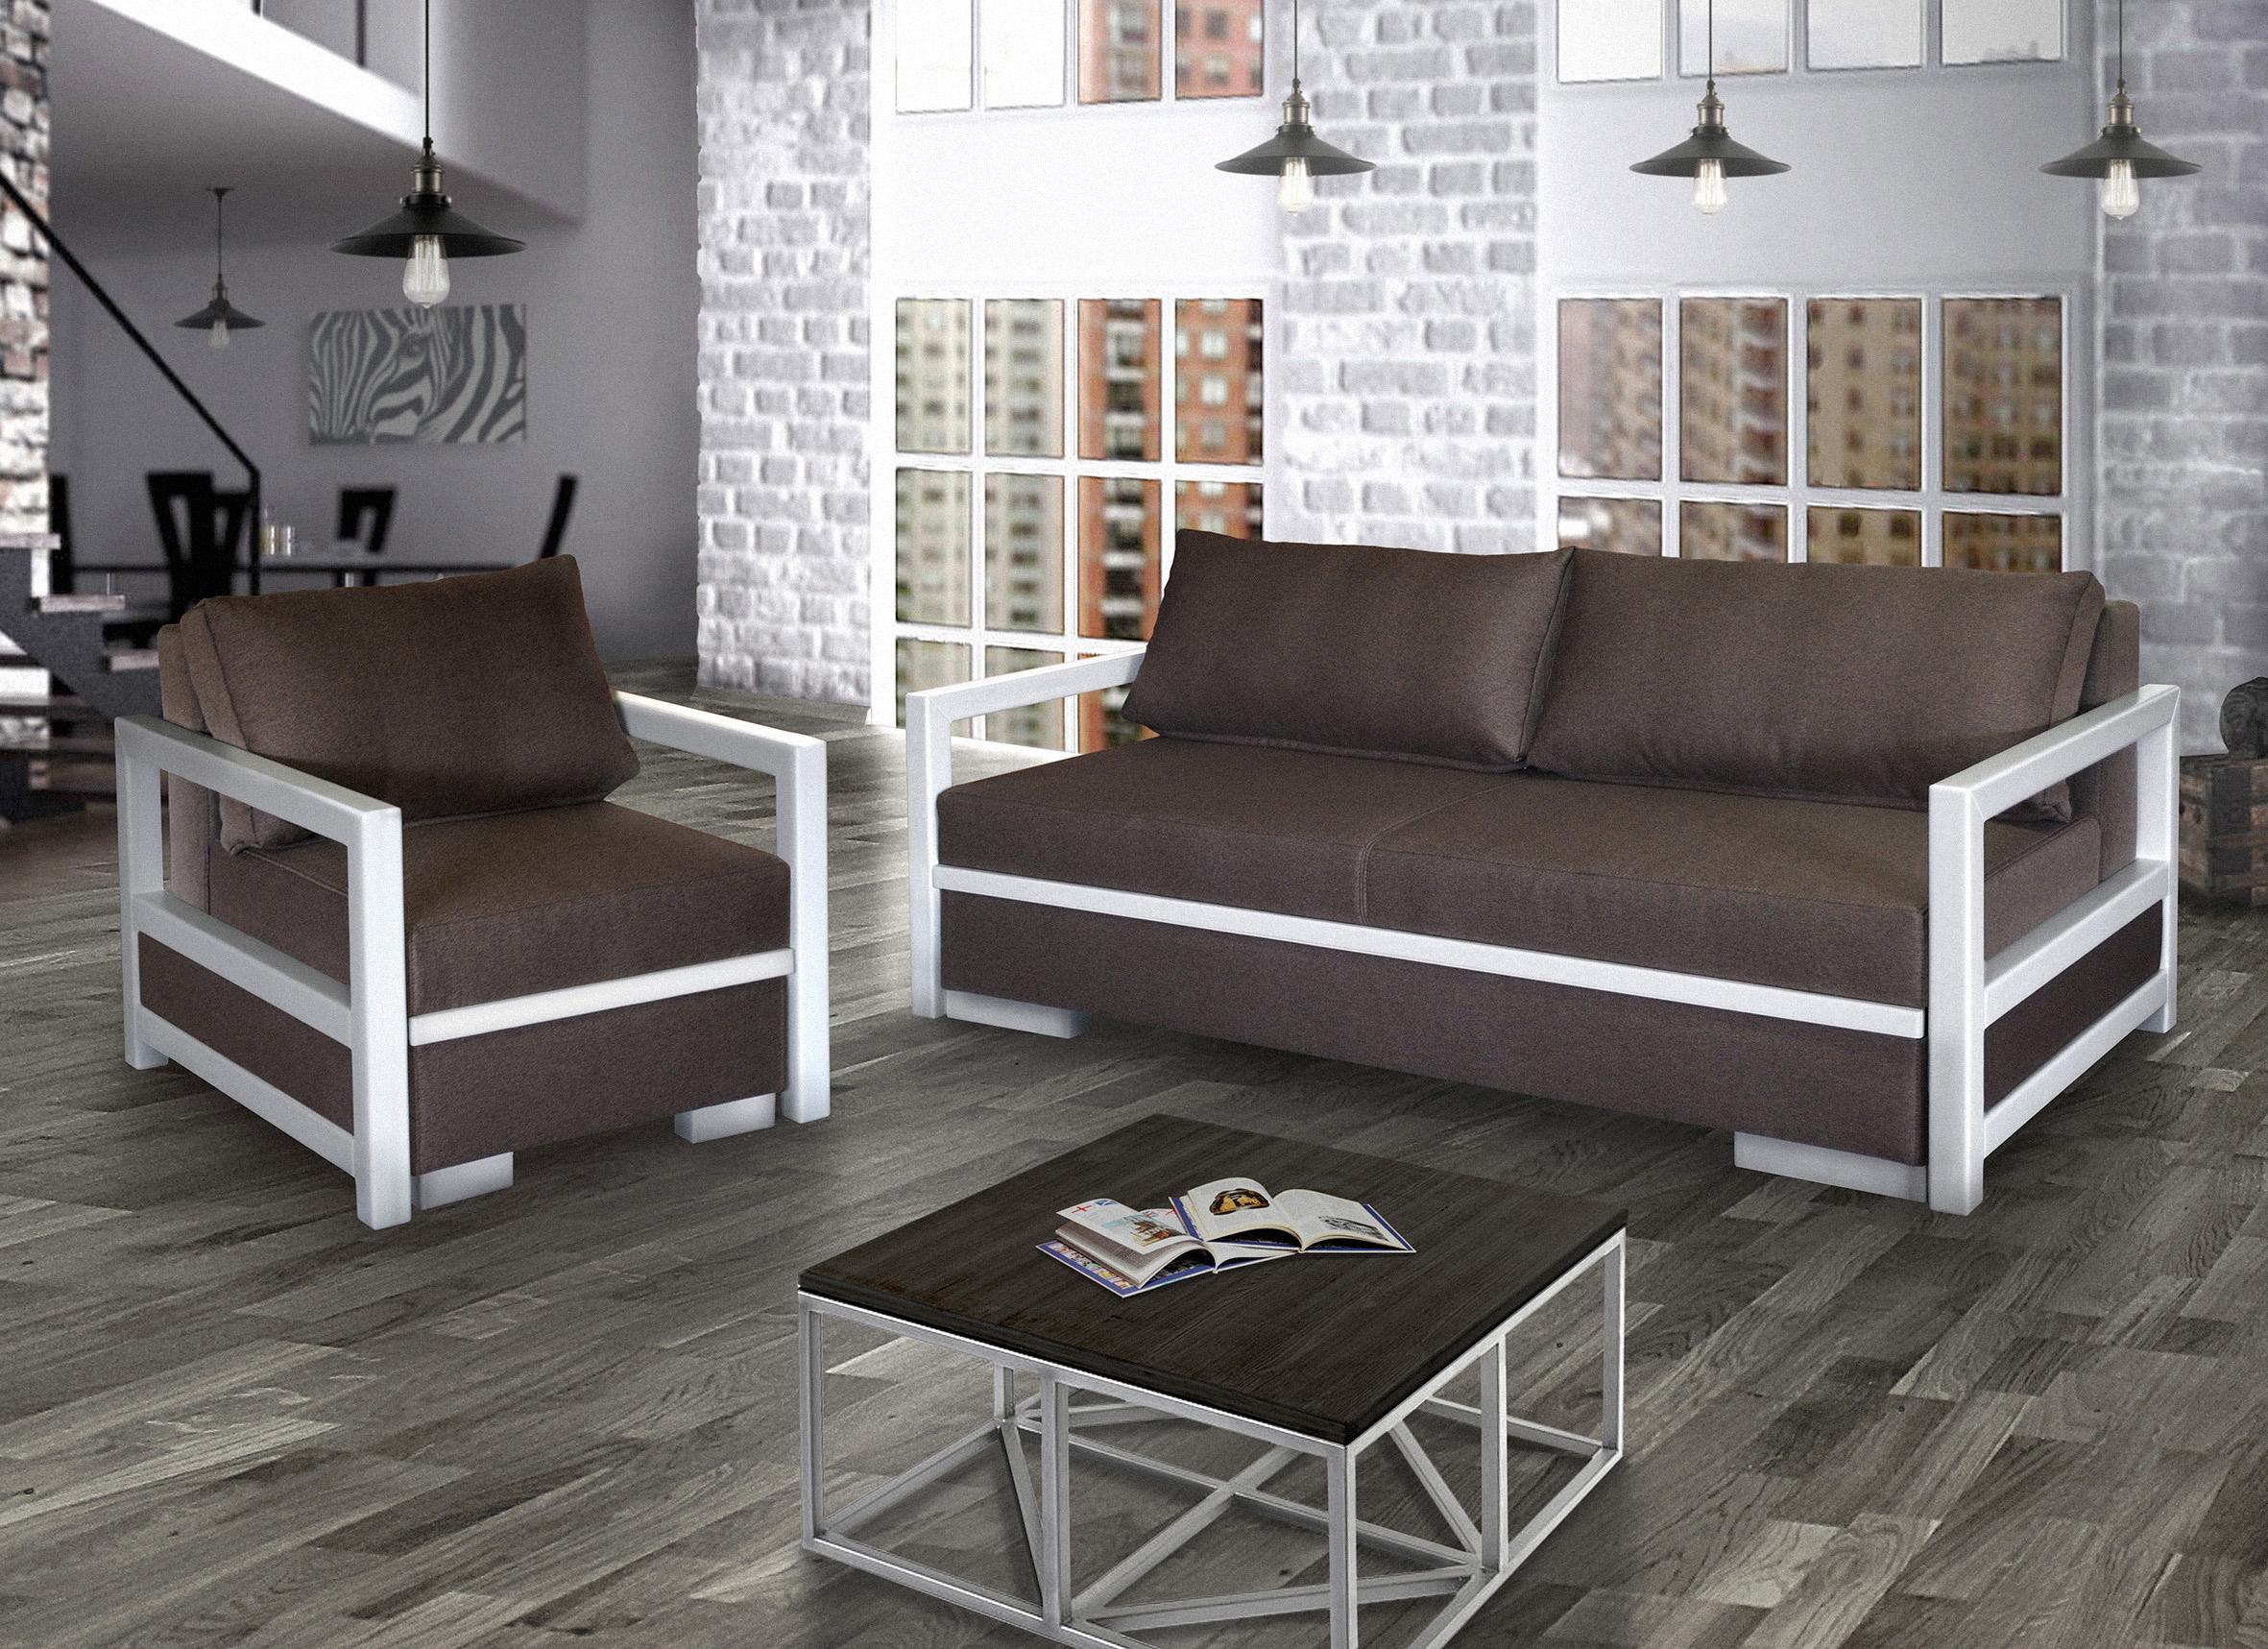 Мягкая мебель для зоны отдыха